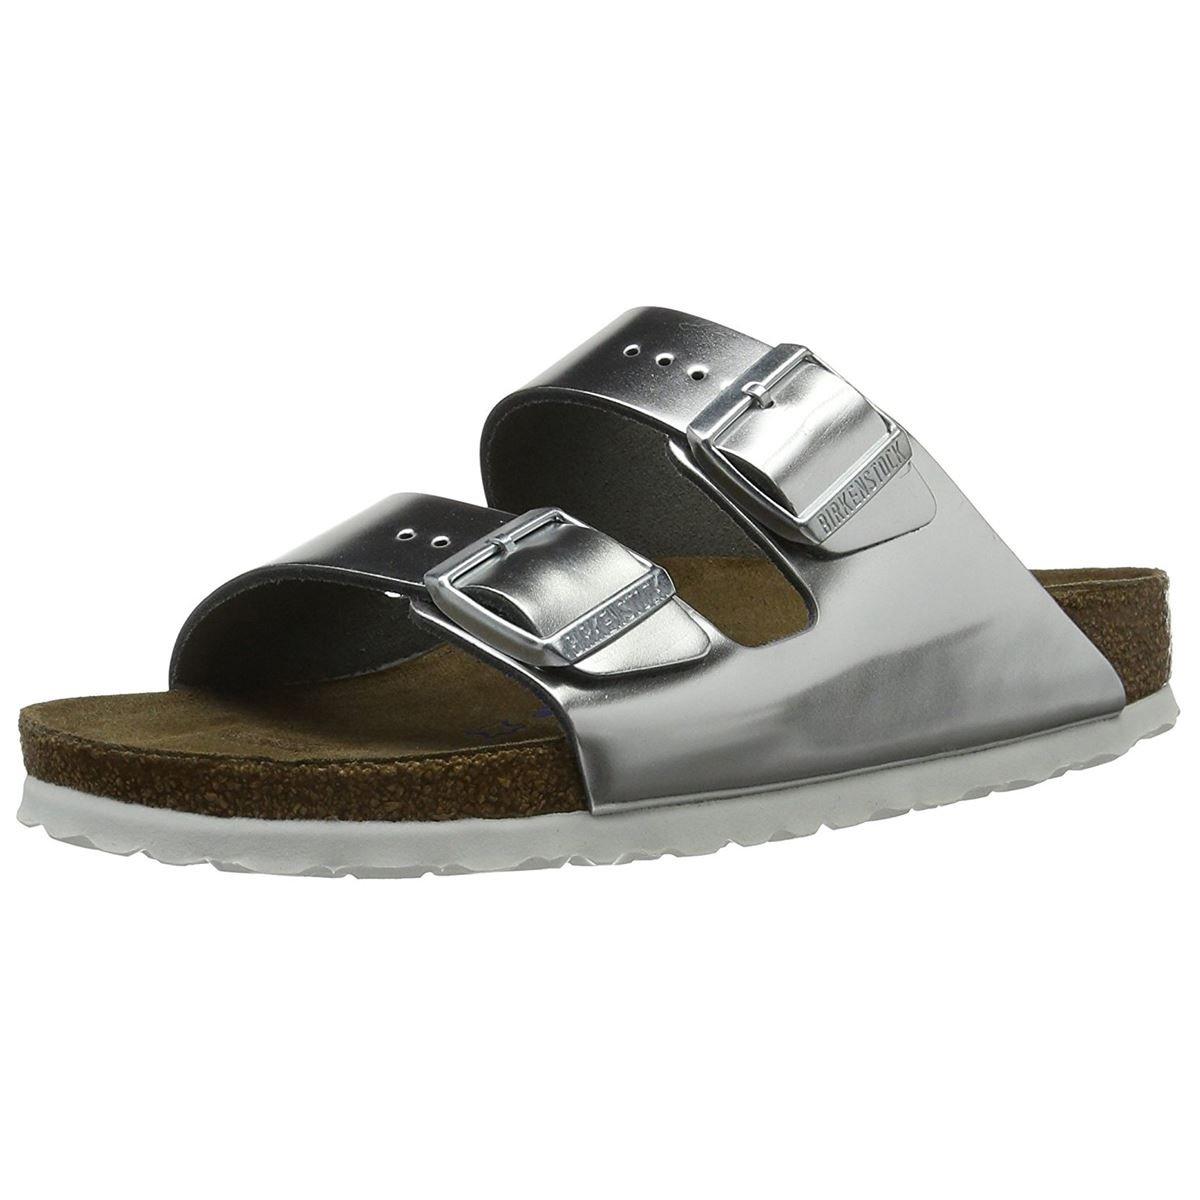 Birkenstock Arizona Metallic Silver Soft Footbed Leather Sandal 38 N (US Women's 7-7.5)